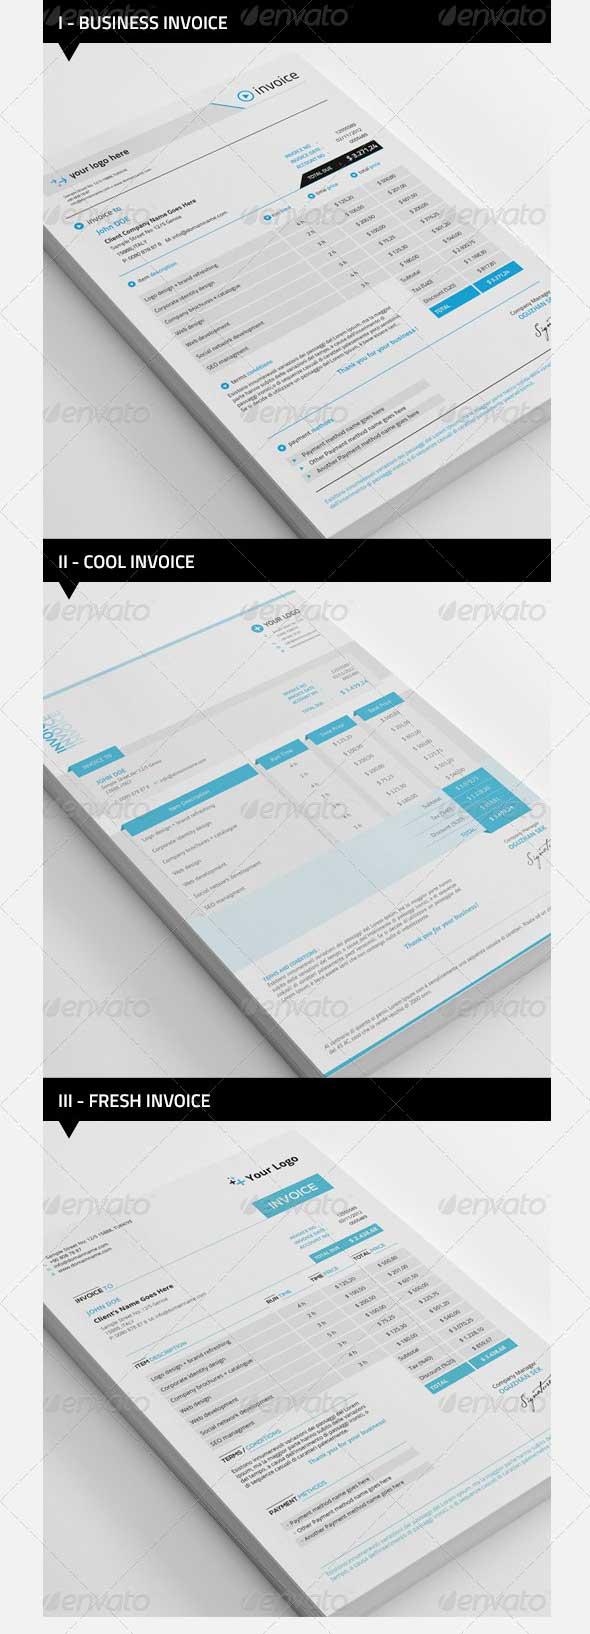 invoice-templates-bundle